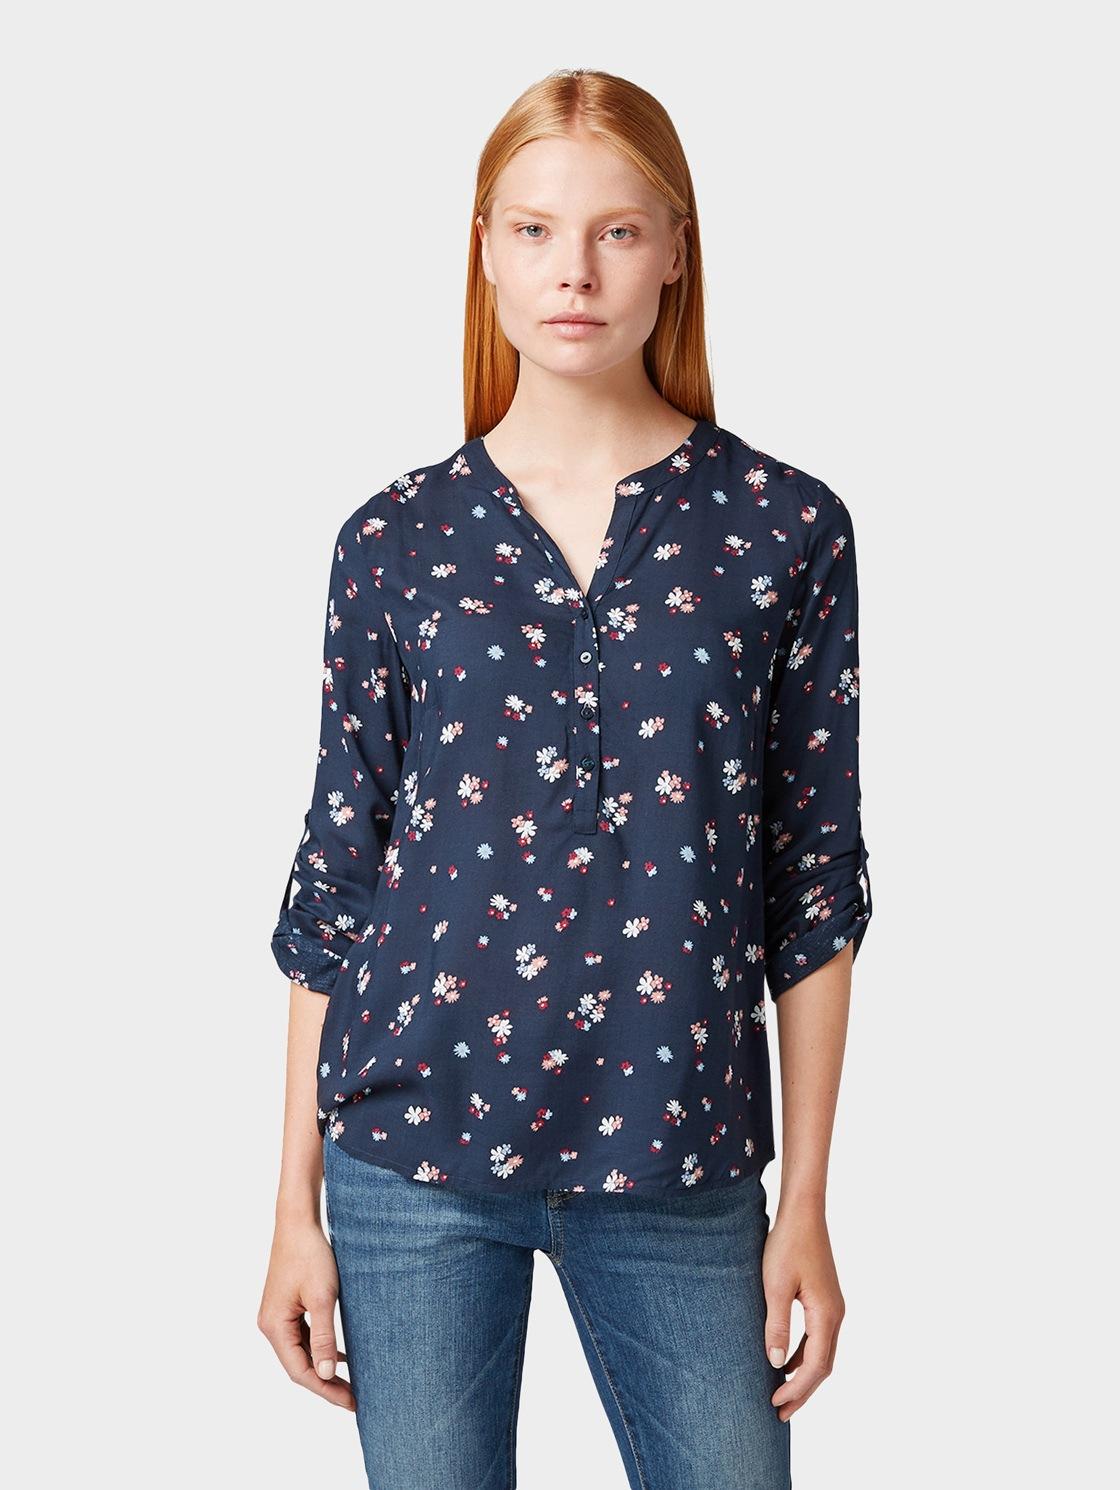 TOM TAILOR Shirtbluse Bluse mit Blumen-Print